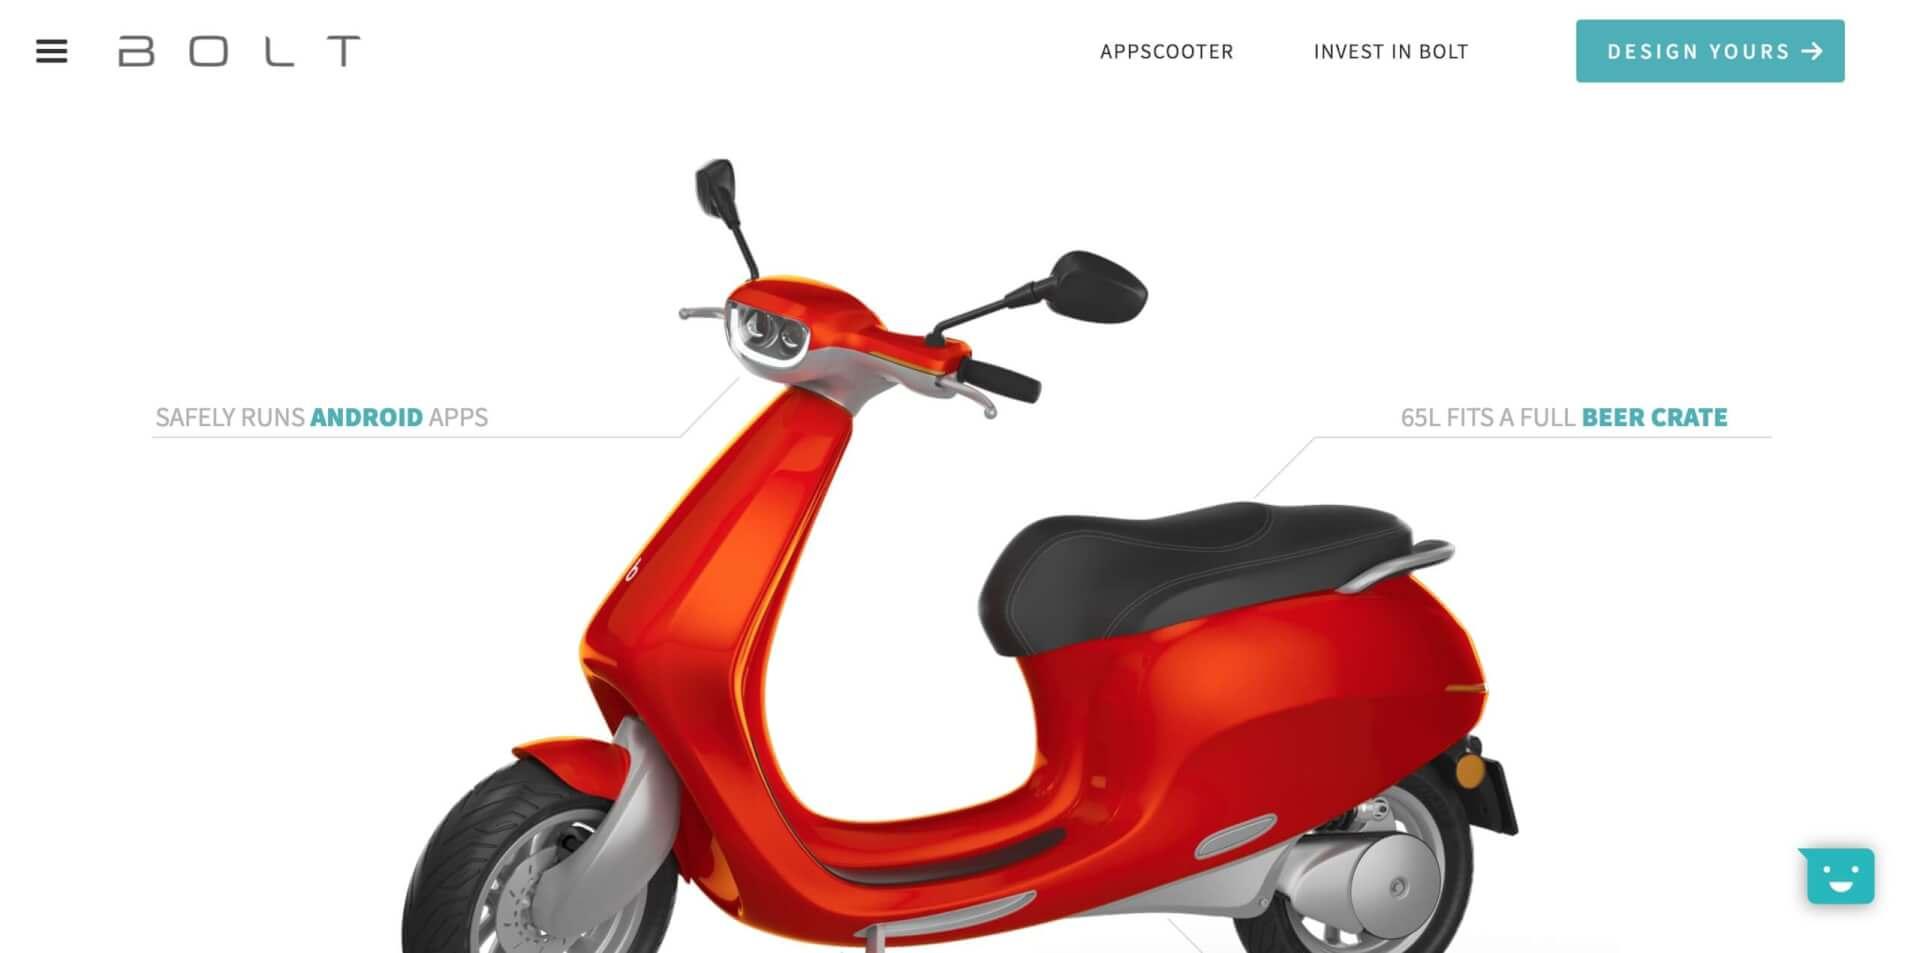 AppScooter E Roller Bolt Mobility